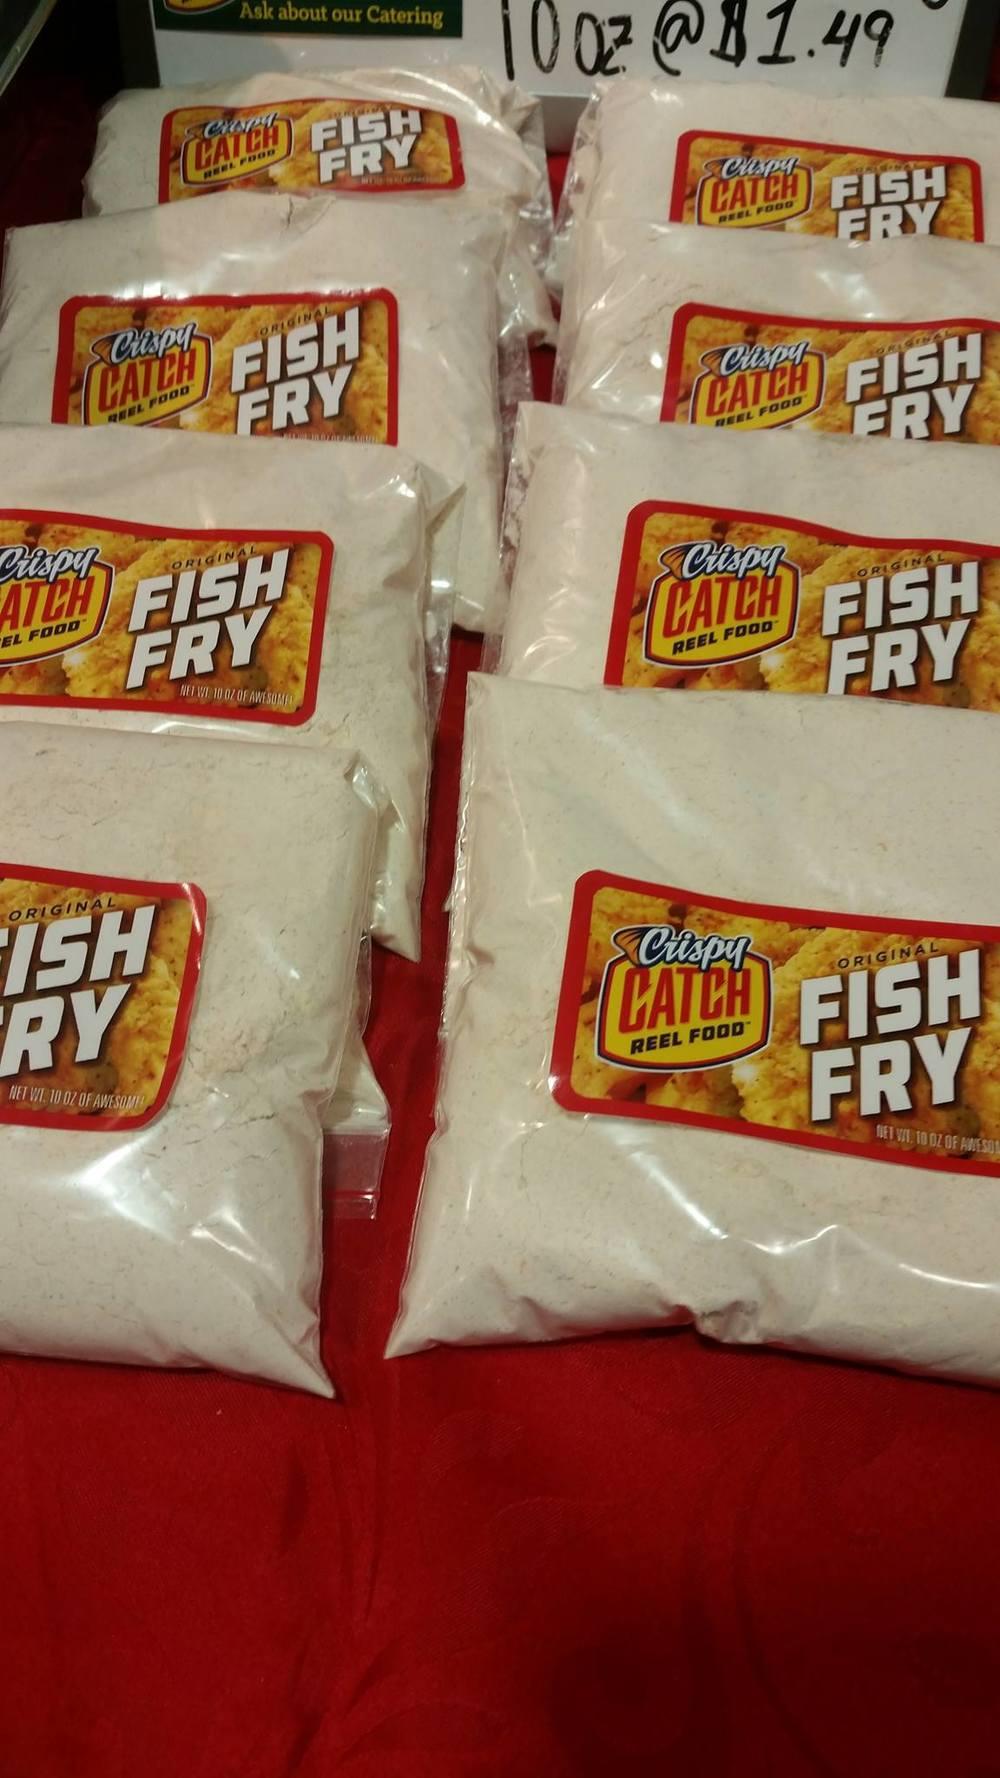 Crispy Fish Fry $1.49